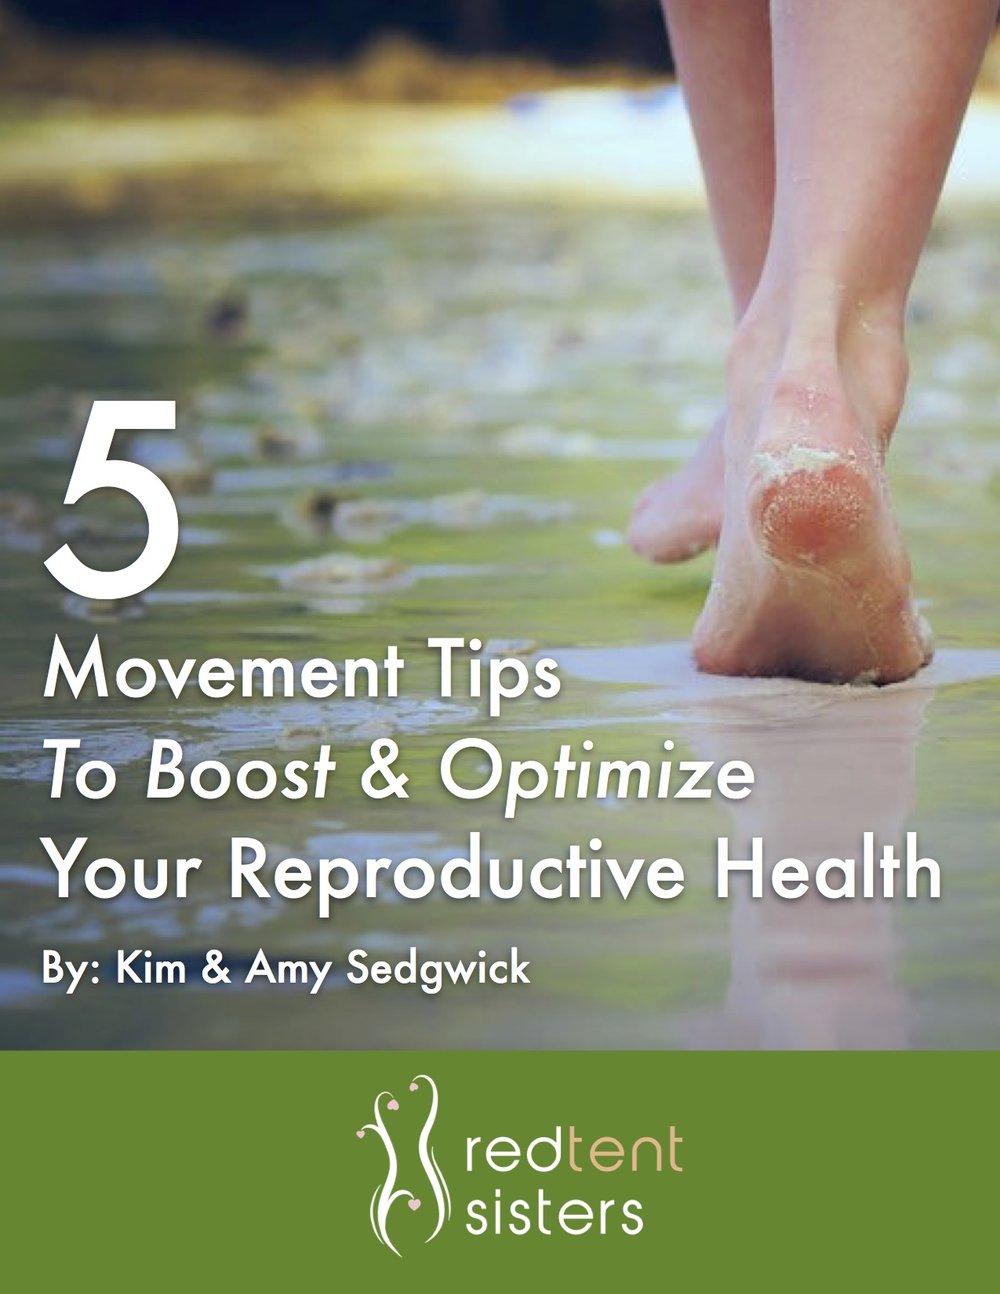 5 Movement Tips (dragged).jpg